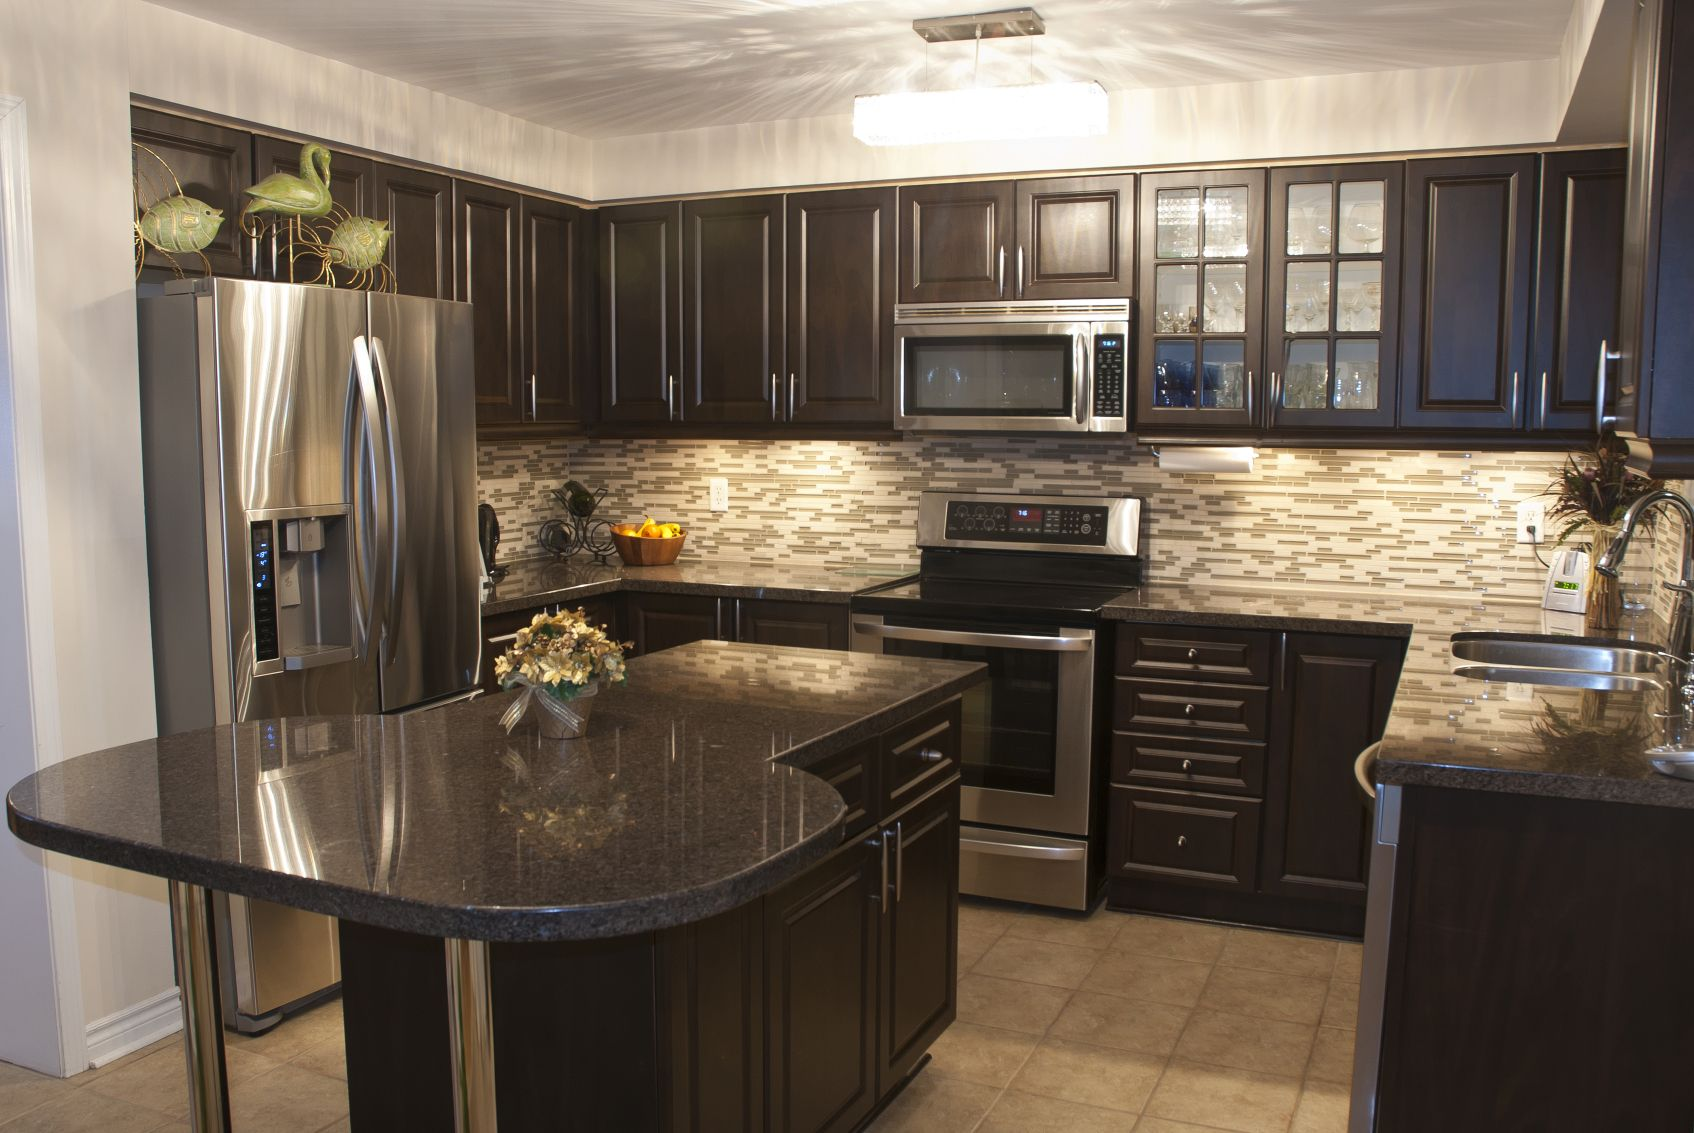 Photos Of Black Kitchen Countertops Cliff Kitchen – Black Kitchen Counter